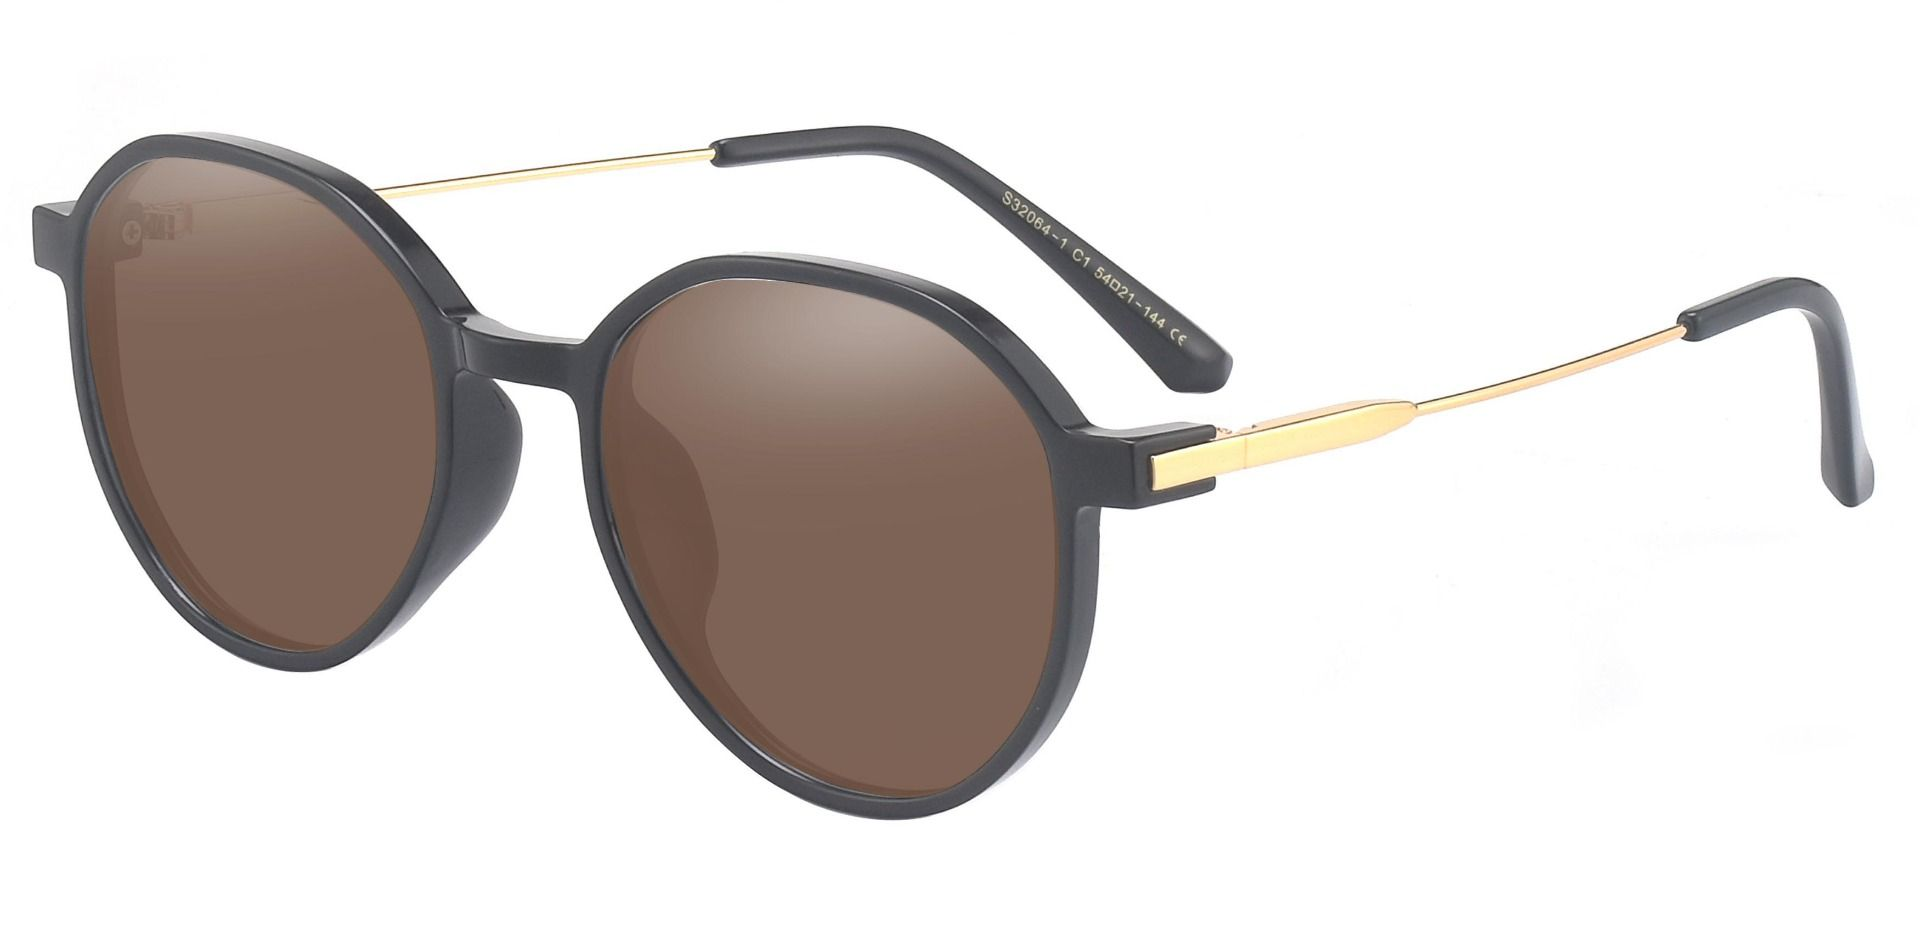 Daytona Geometric Prescription Sunglasses - Black Frame With Brown Lenses